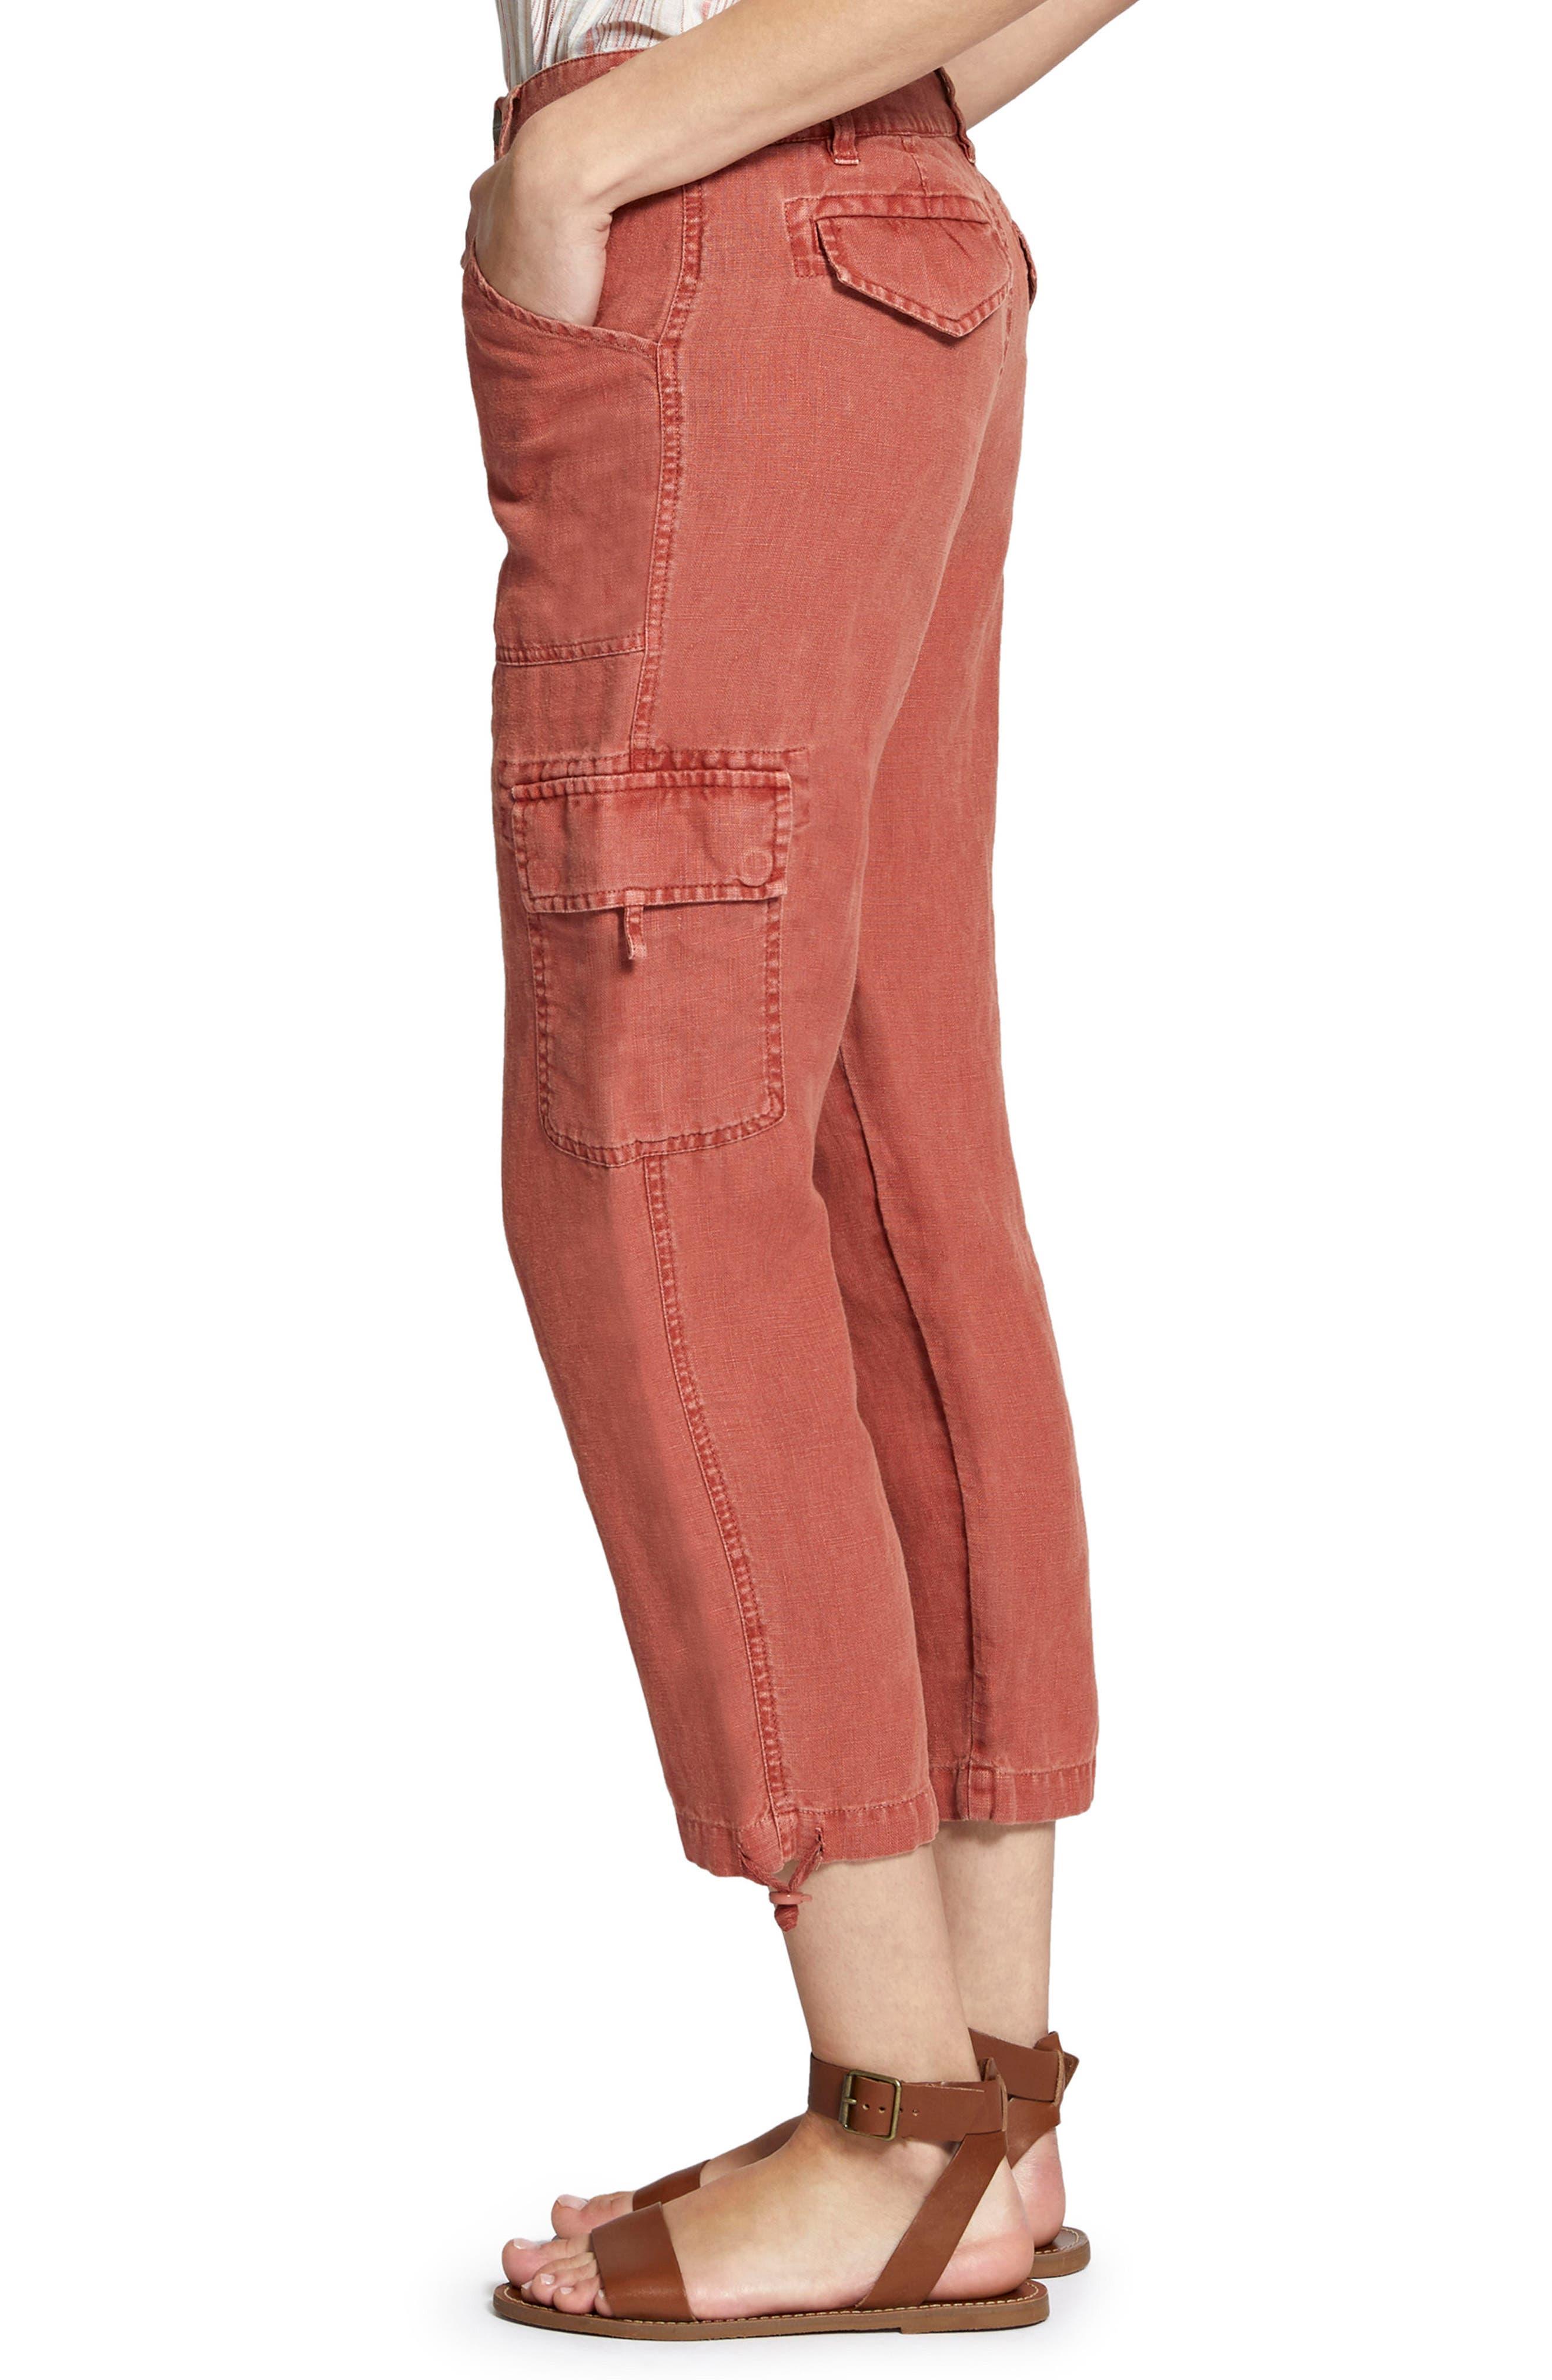 Terrain Linen Crop Cargo Pants,                             Alternate thumbnail 3, color,                             Terra Cotta